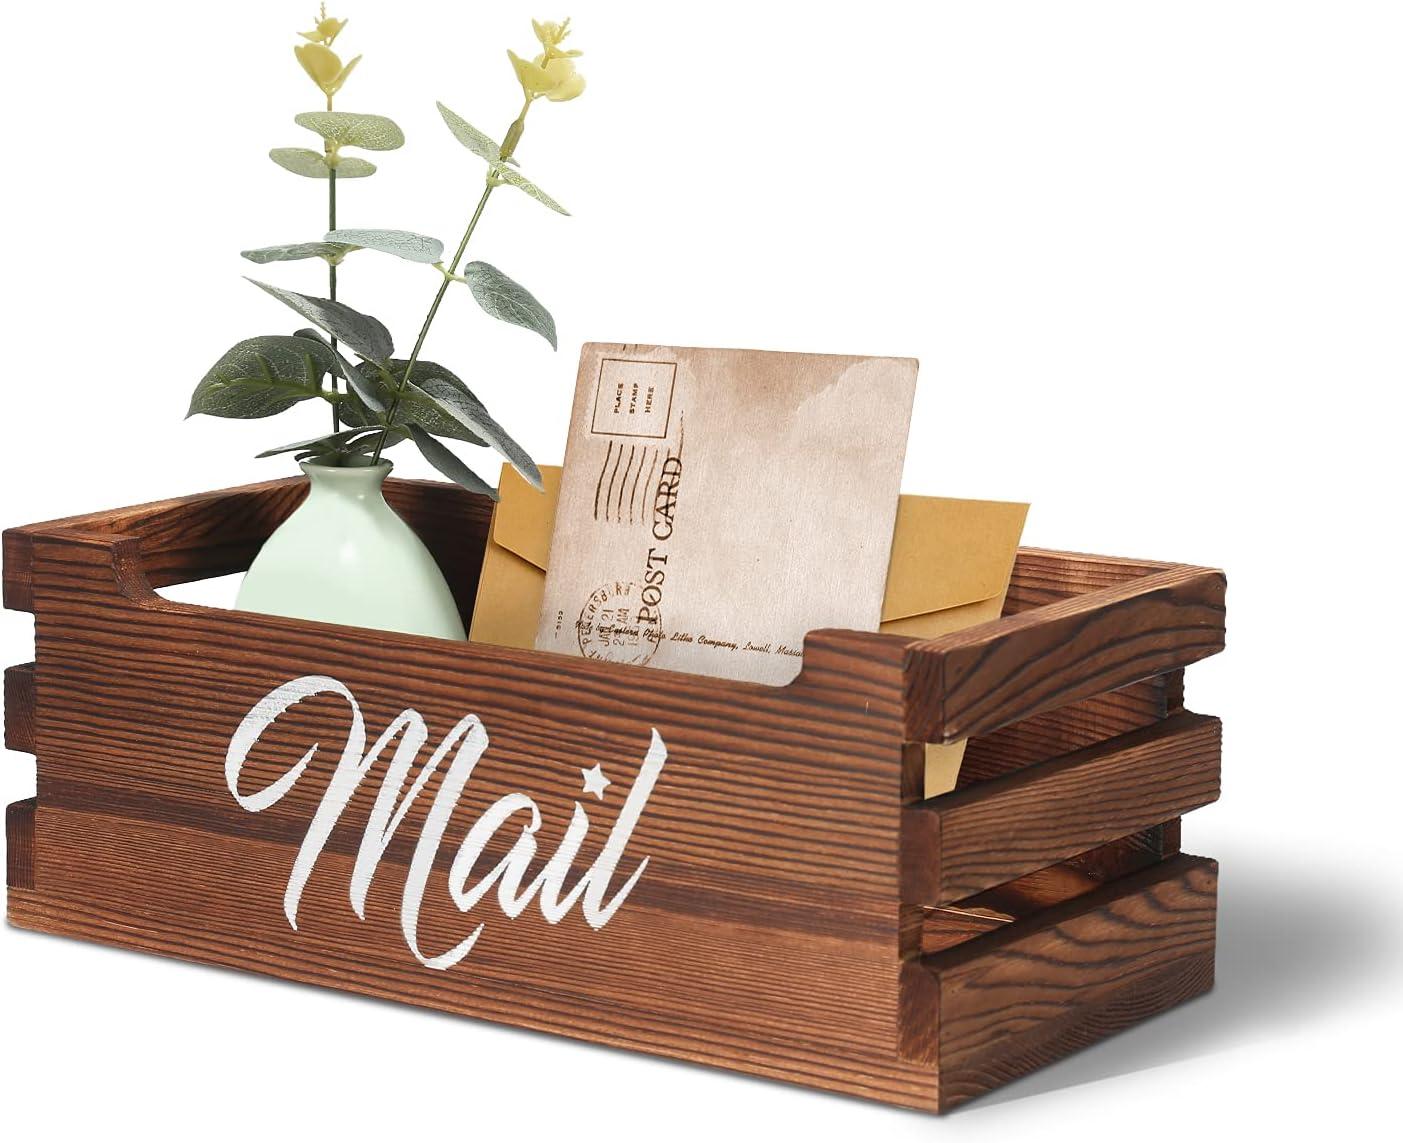 VOOWO Wooden Mail Organizer, Decorative Mail Holder Box, Desktop Wood Mail Organizer Box for Home, Office Letter Holder Organizer